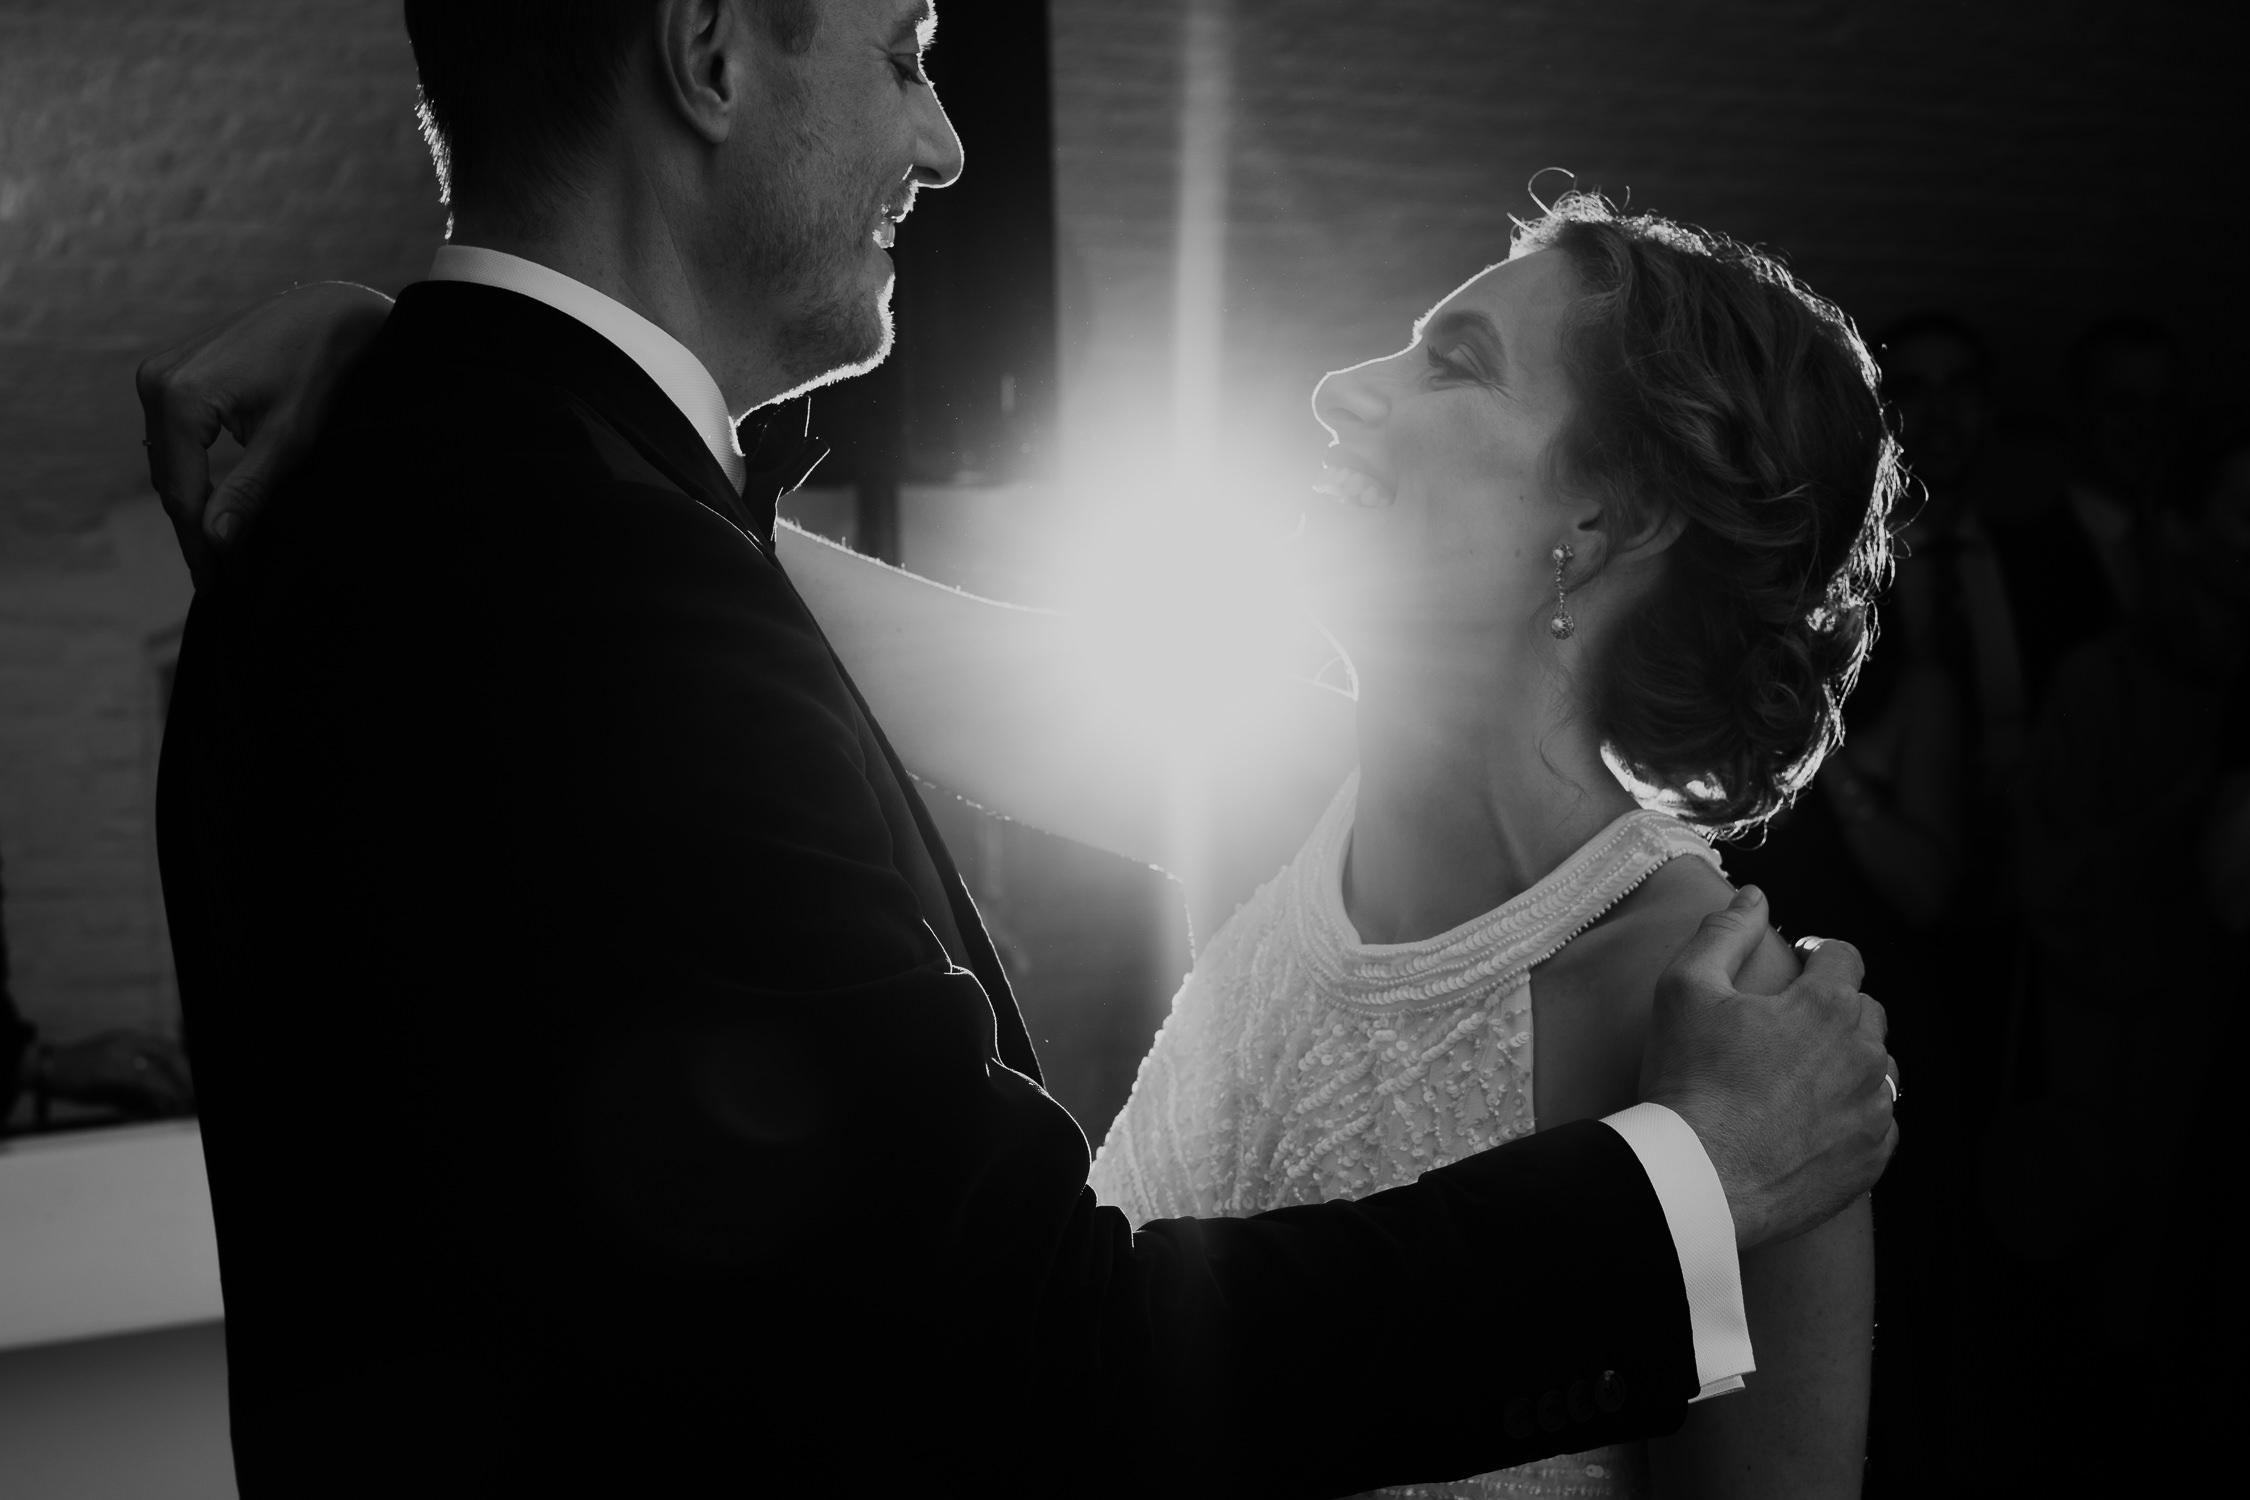 couple photograped wedding party flash photography